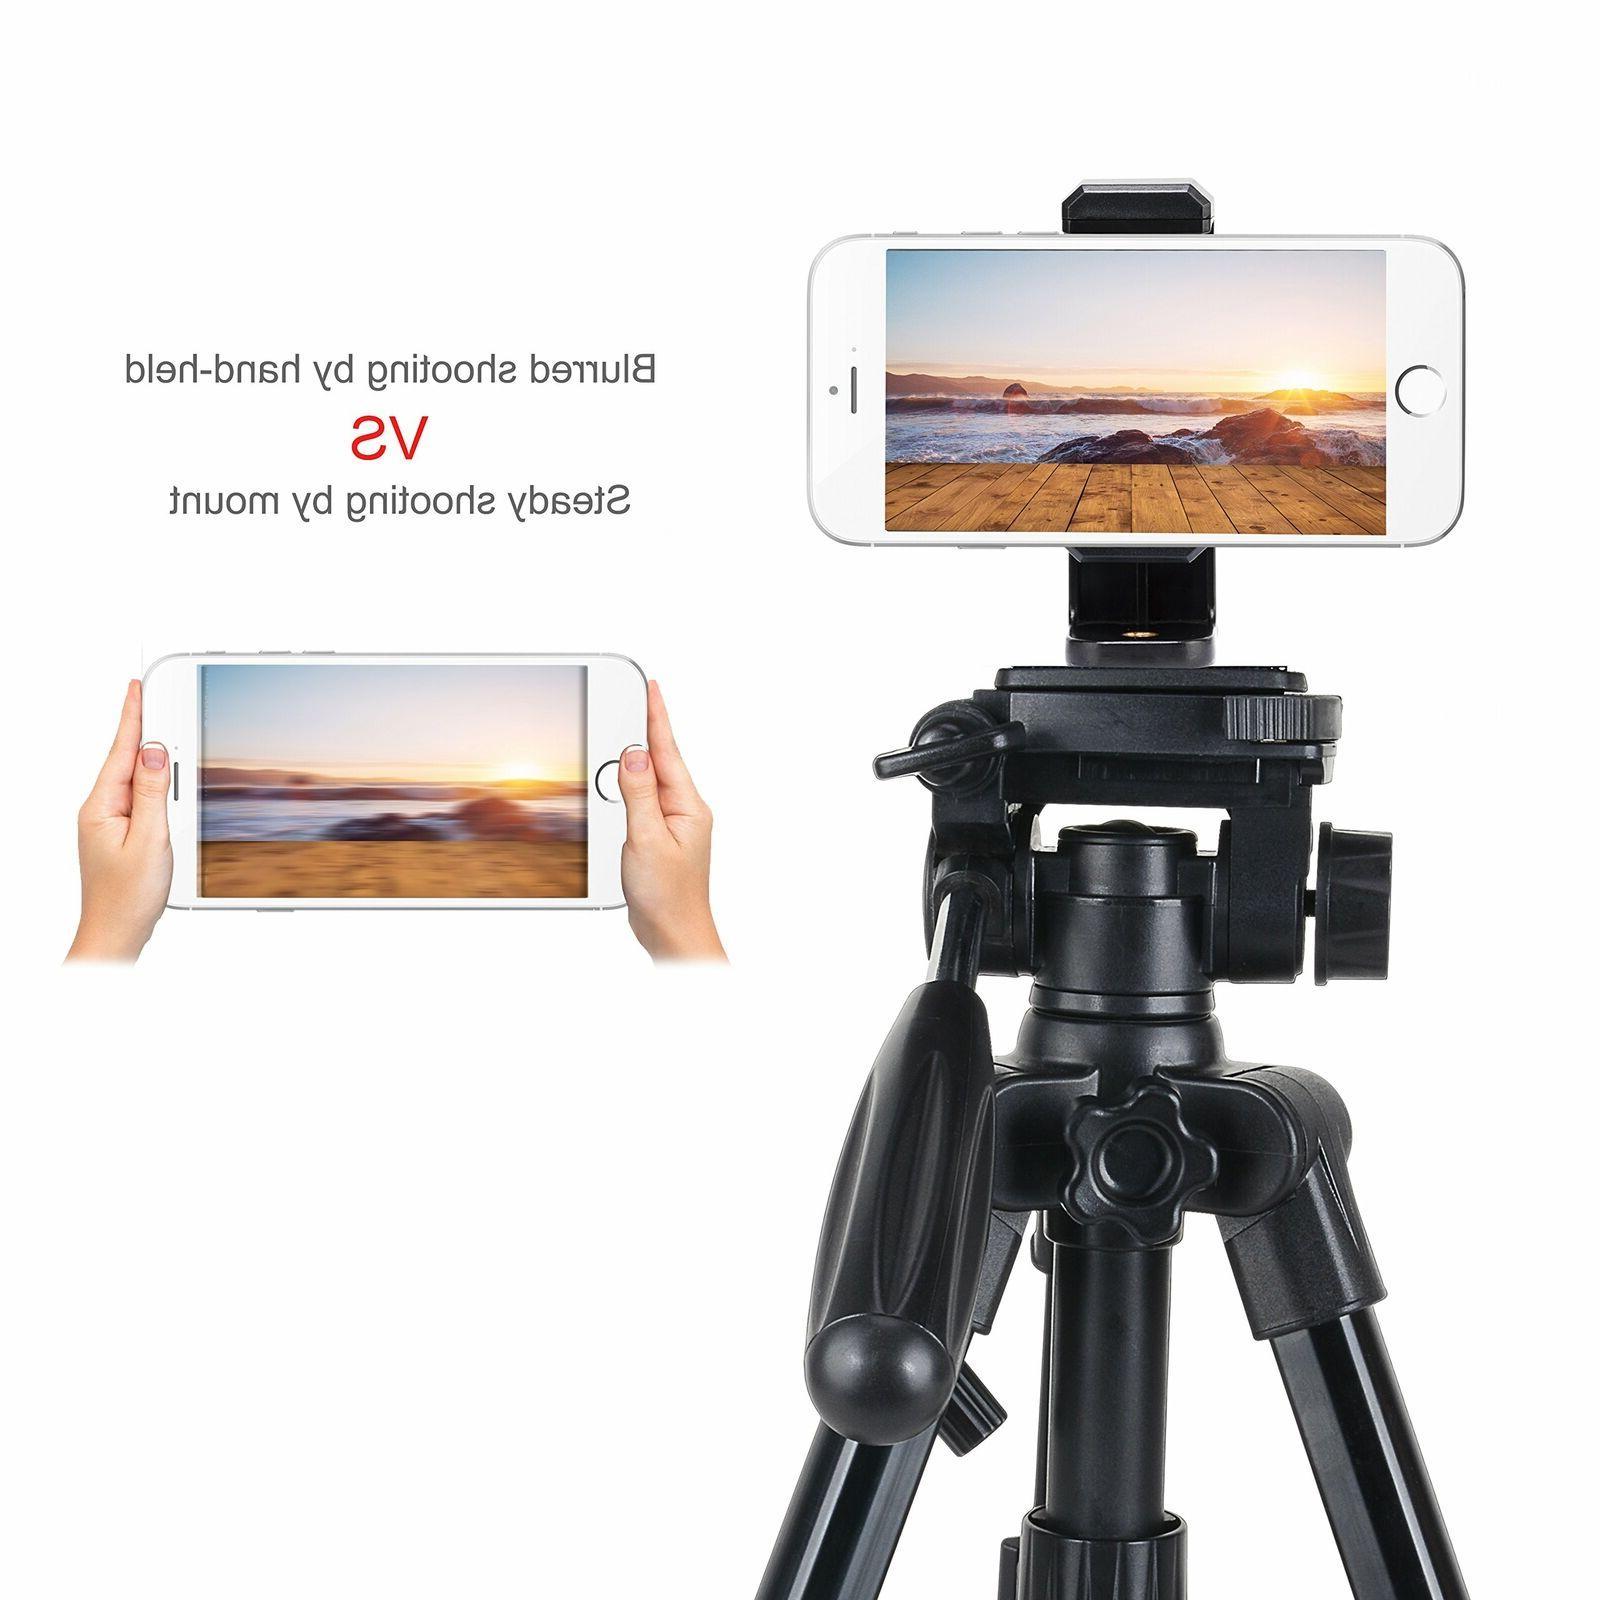 Smartphone Mount Camera Holder Adapter For Filming